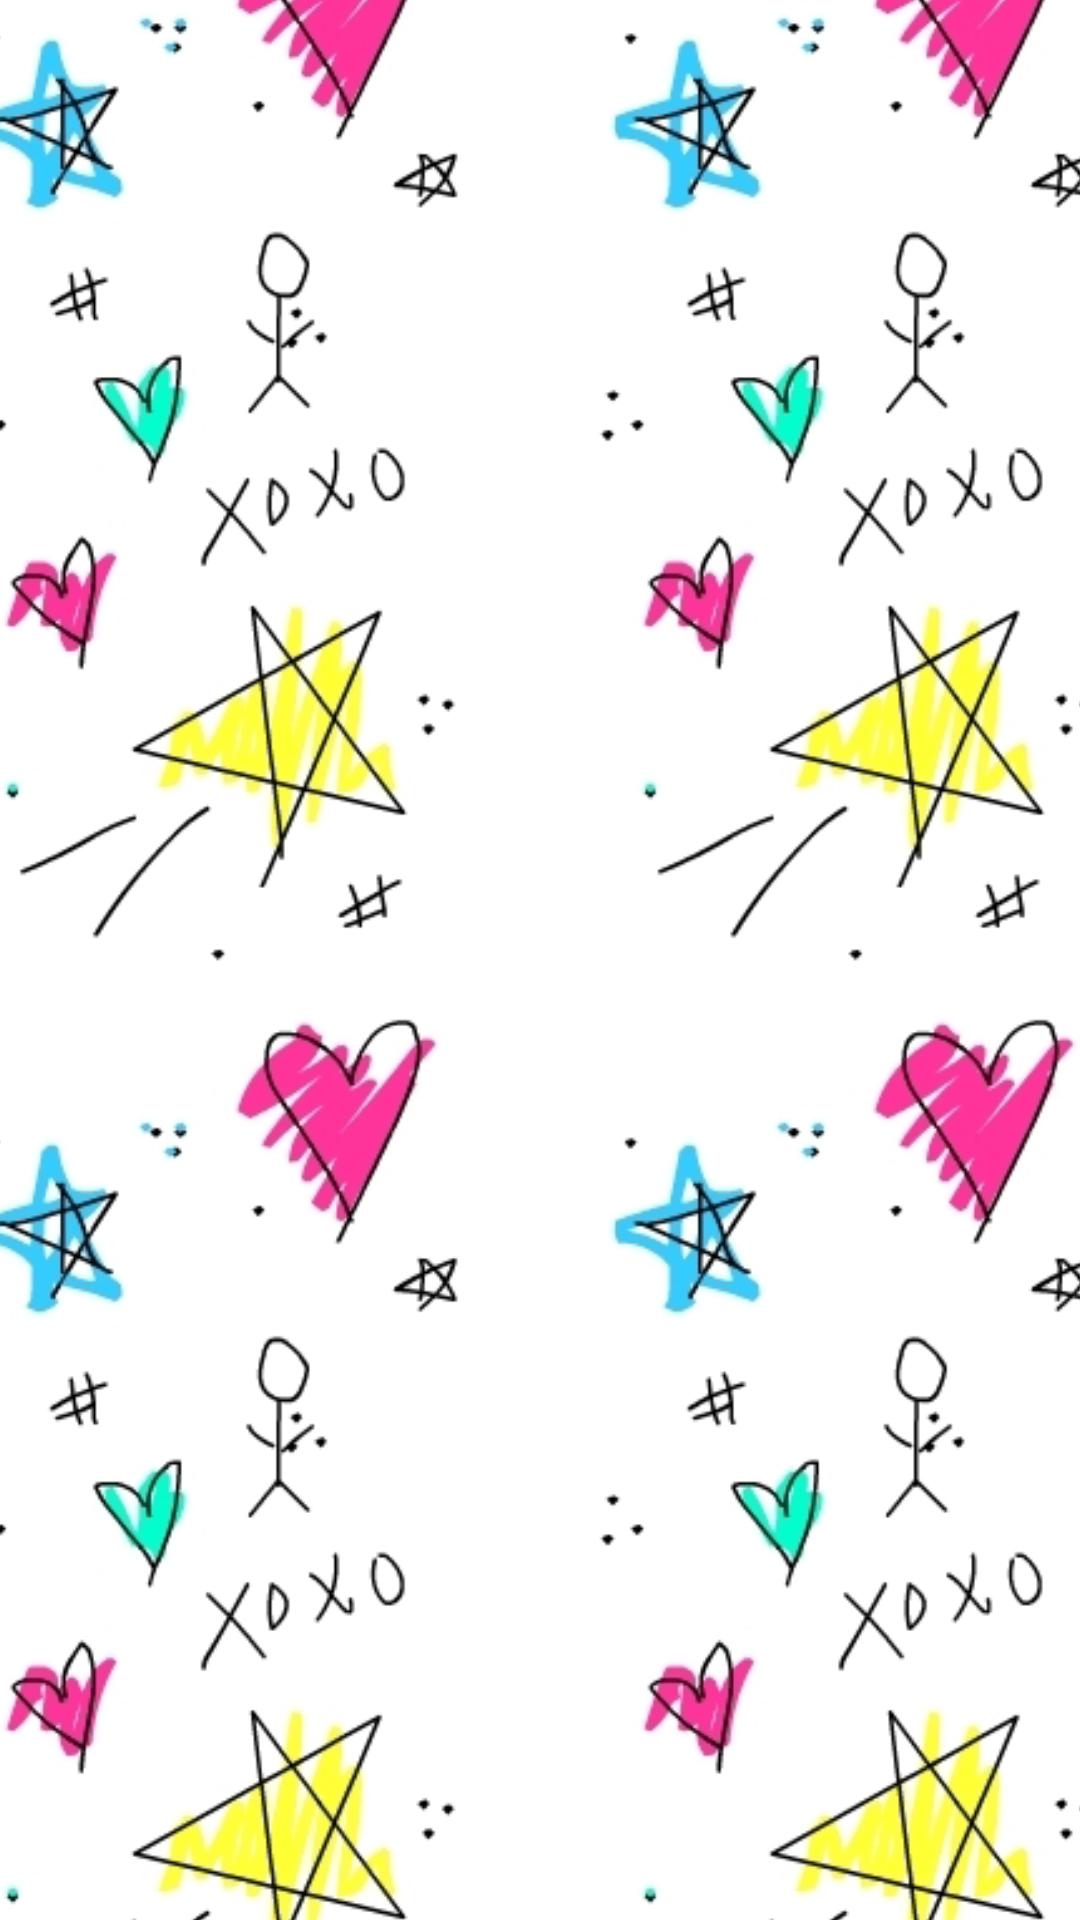 Xoxo wallpaper iphone wallpaper xoxo wallpaper voltagebd Choice Image